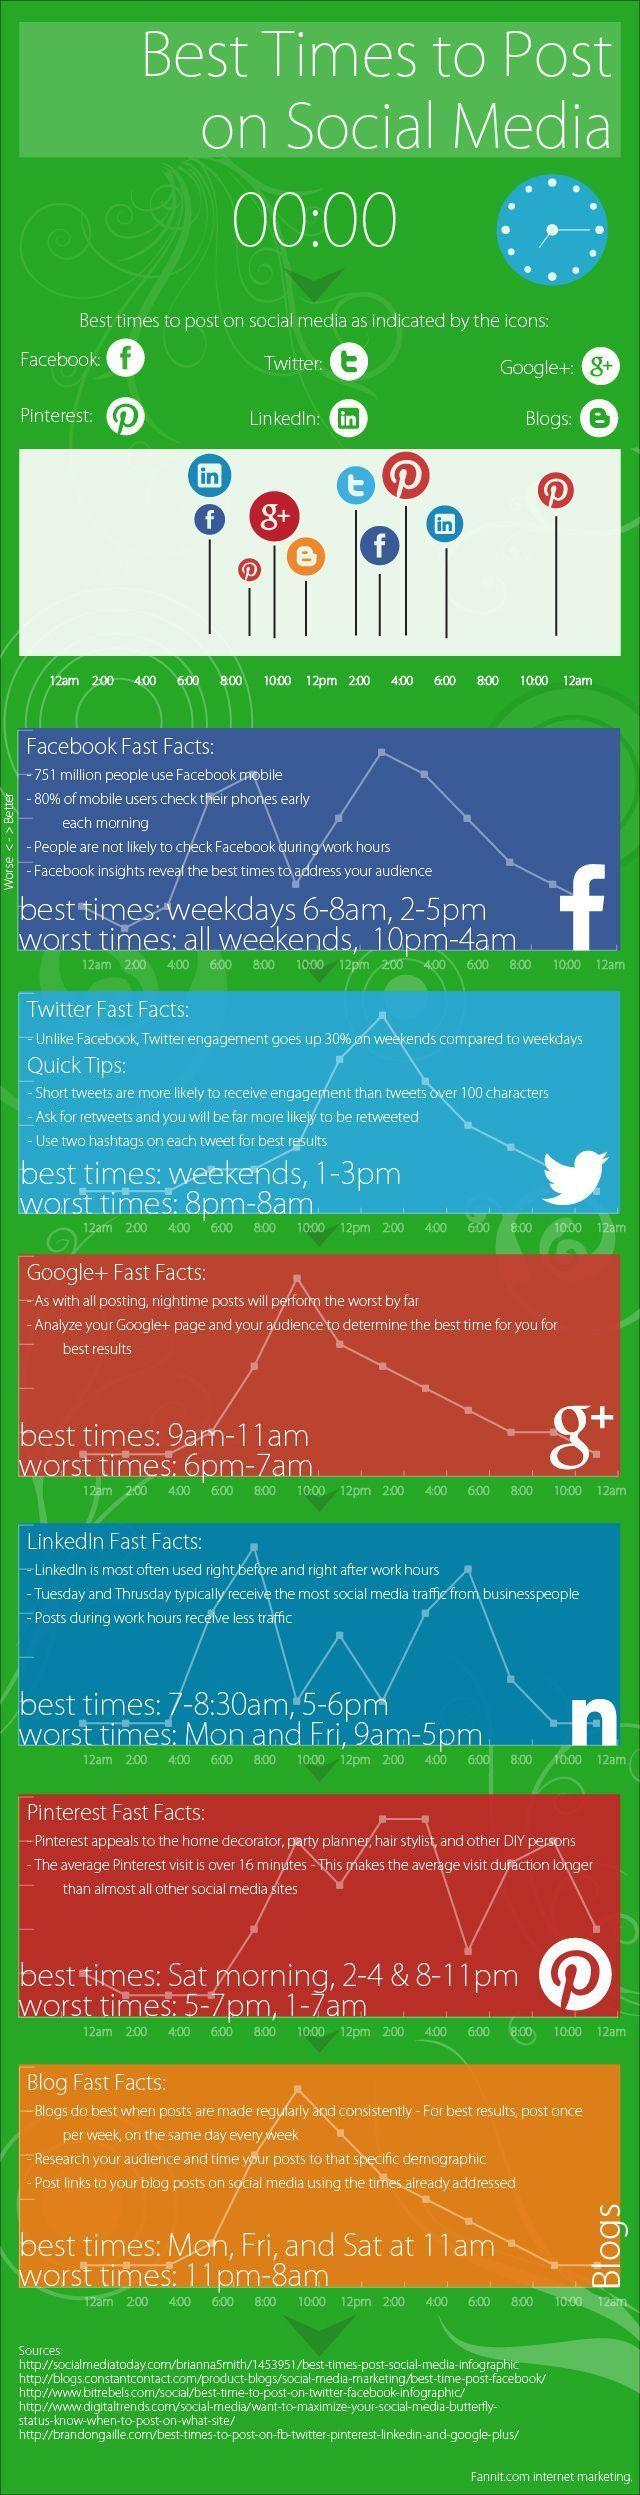 Mejores horas para publicar en las redes sociales. Infografa en ingls. Ttulo original: Best Times to Post on Social Media